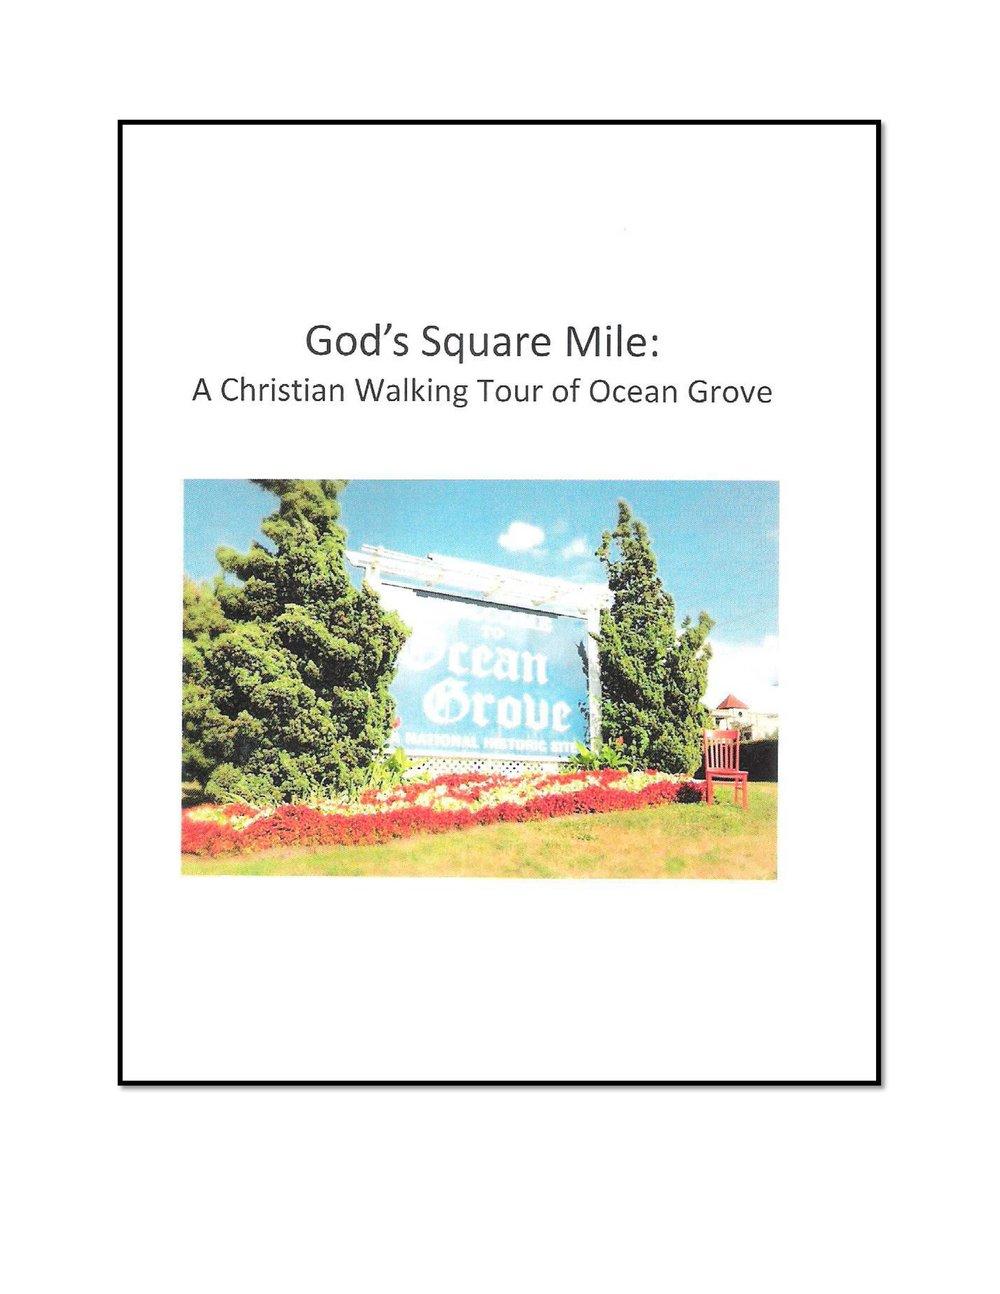 Gods Square Mile 01_0001 (1).jpg